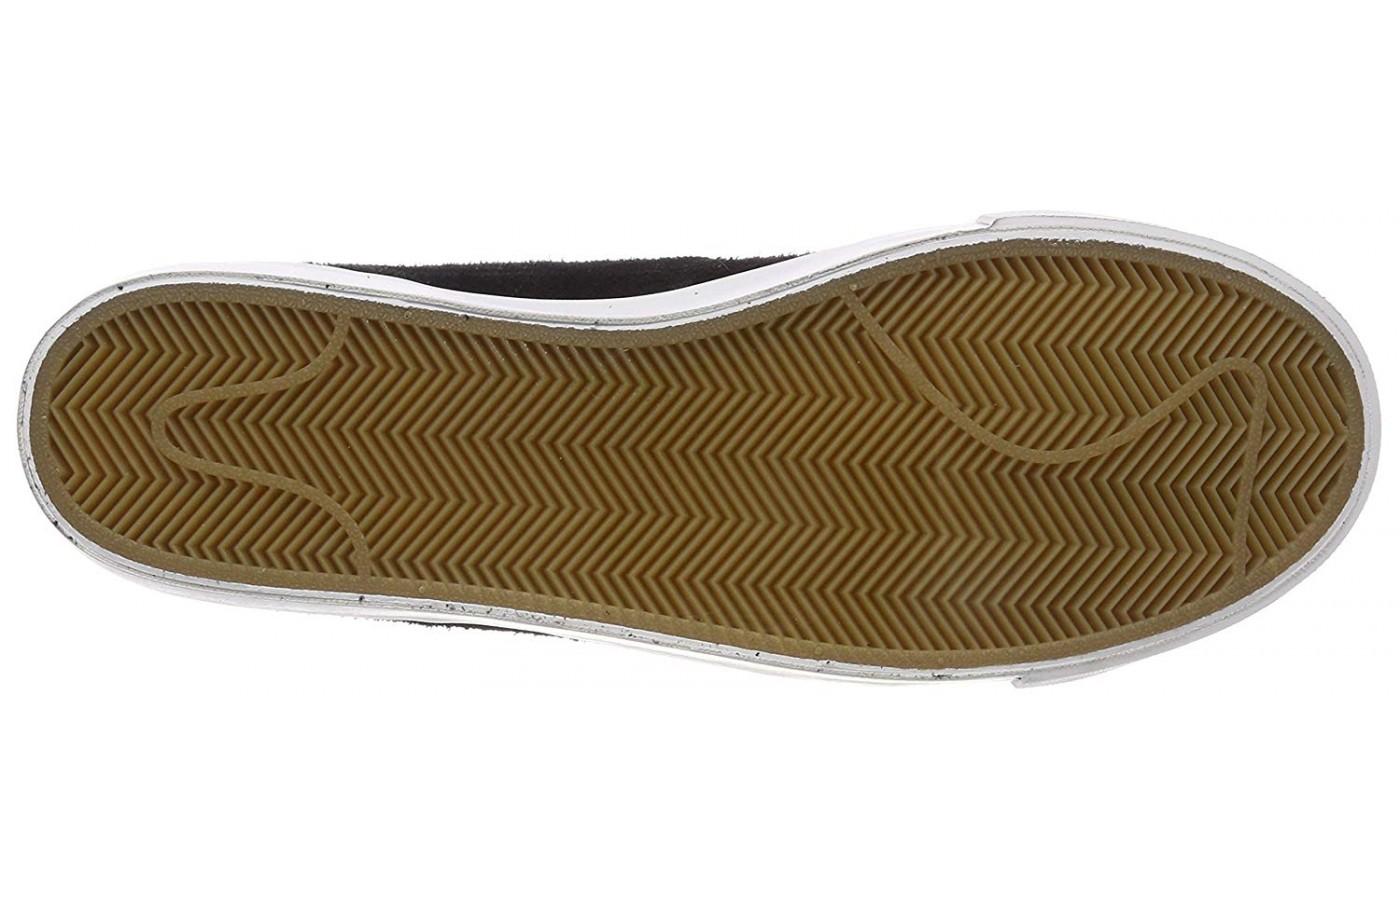 Nike Blazer Mid Sole